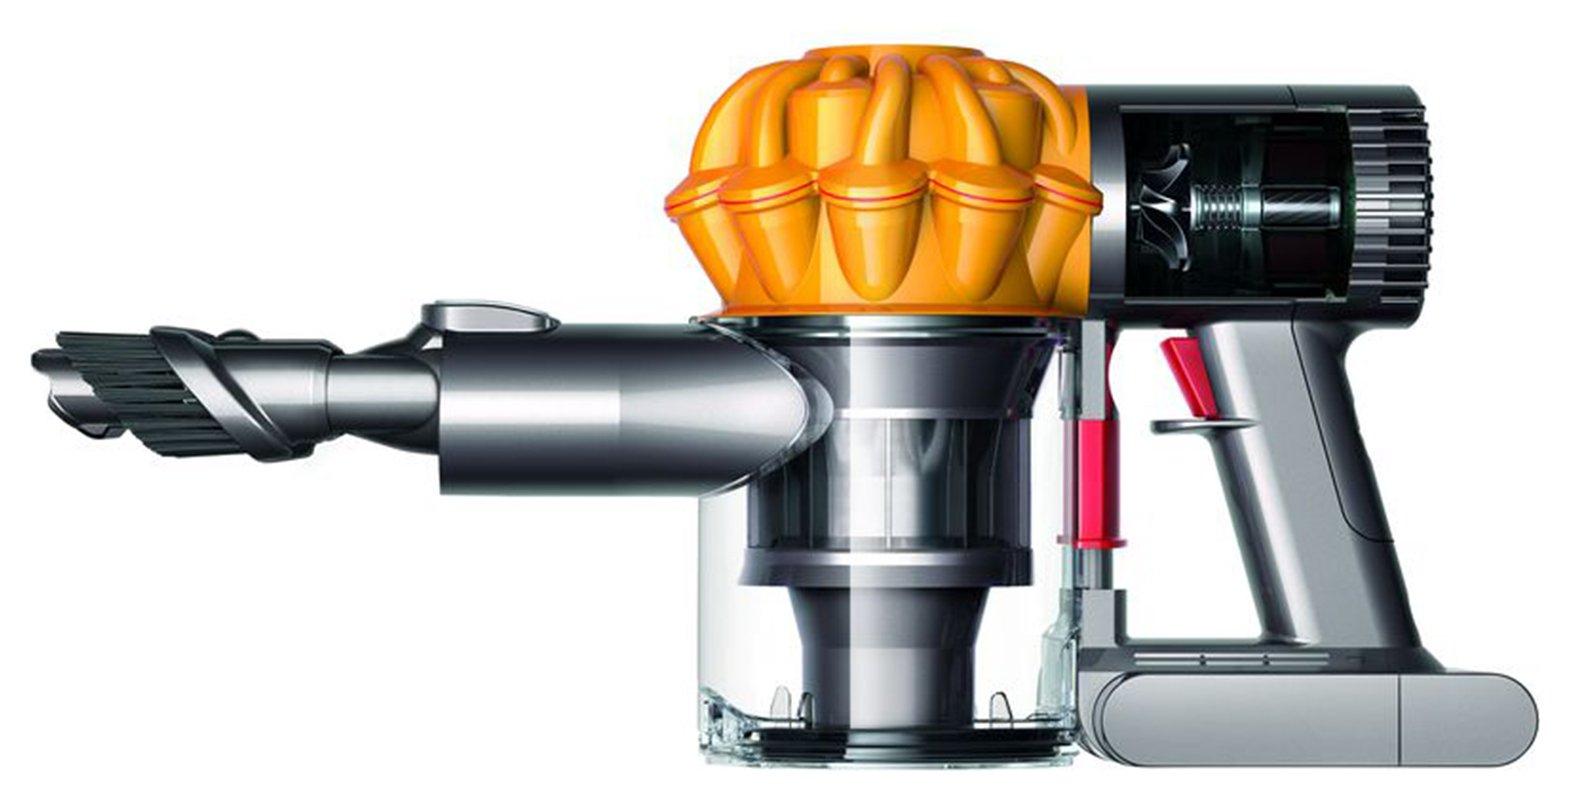 Dyson V6 Trigger Cordless Handheld Vacuum Cleaner - £129.99 @ Argos